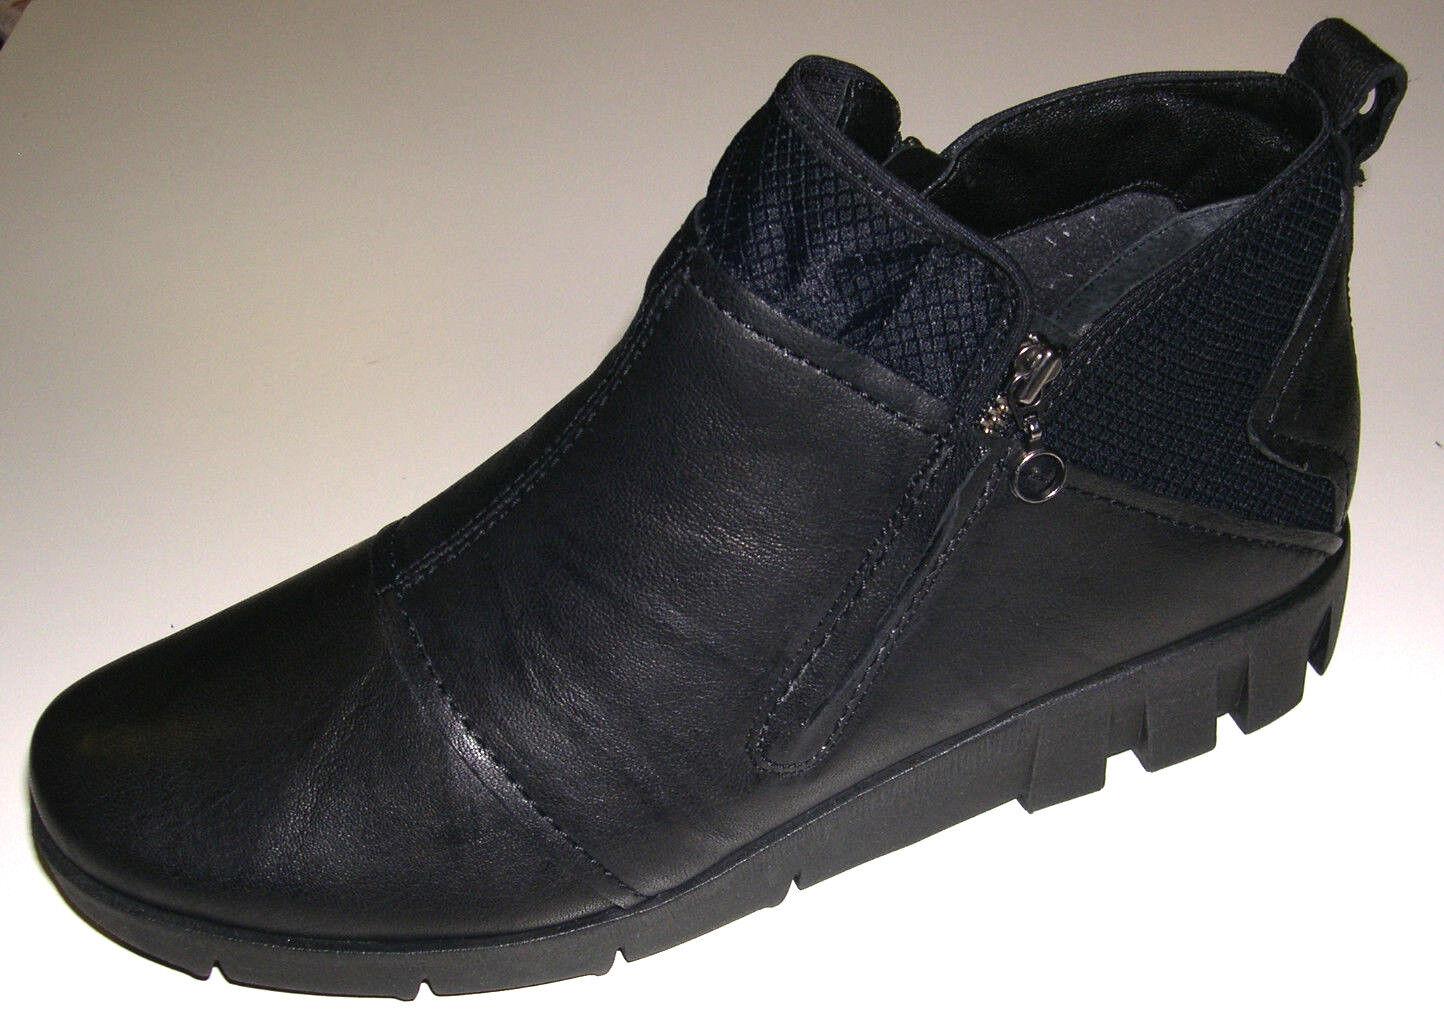 Softwaves zapatos señora botas botín botas 6.94.14, negra, cuero